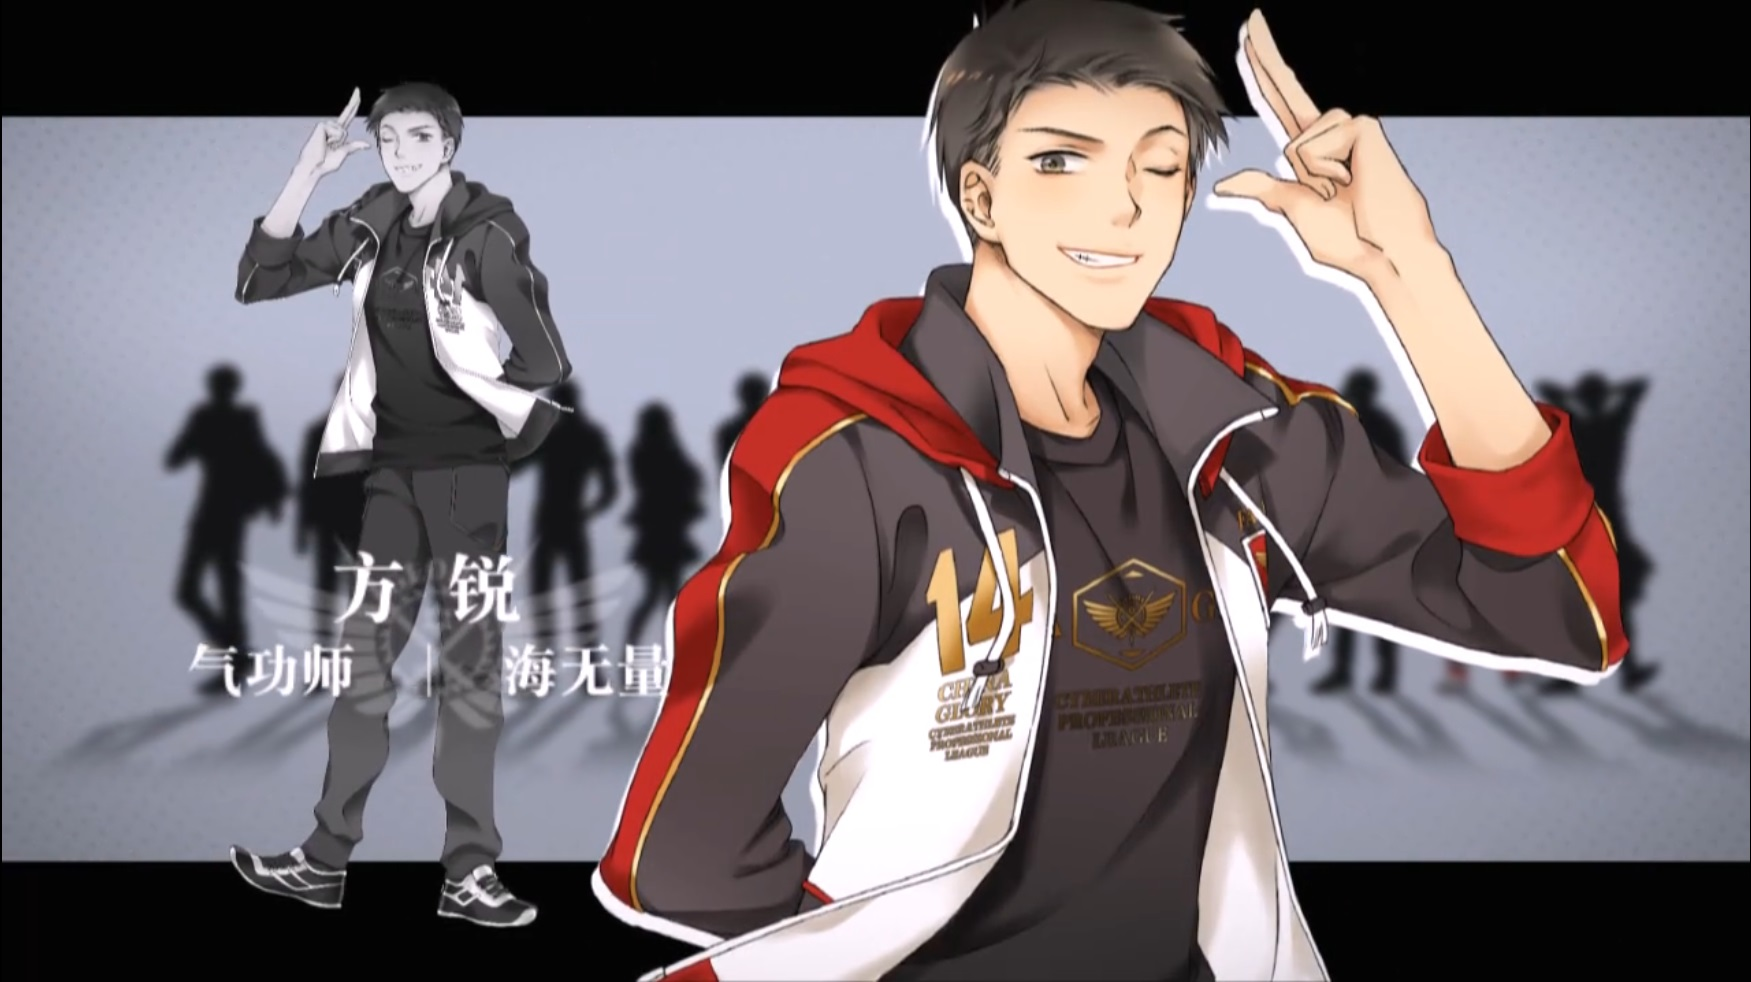 Ji Xinjie